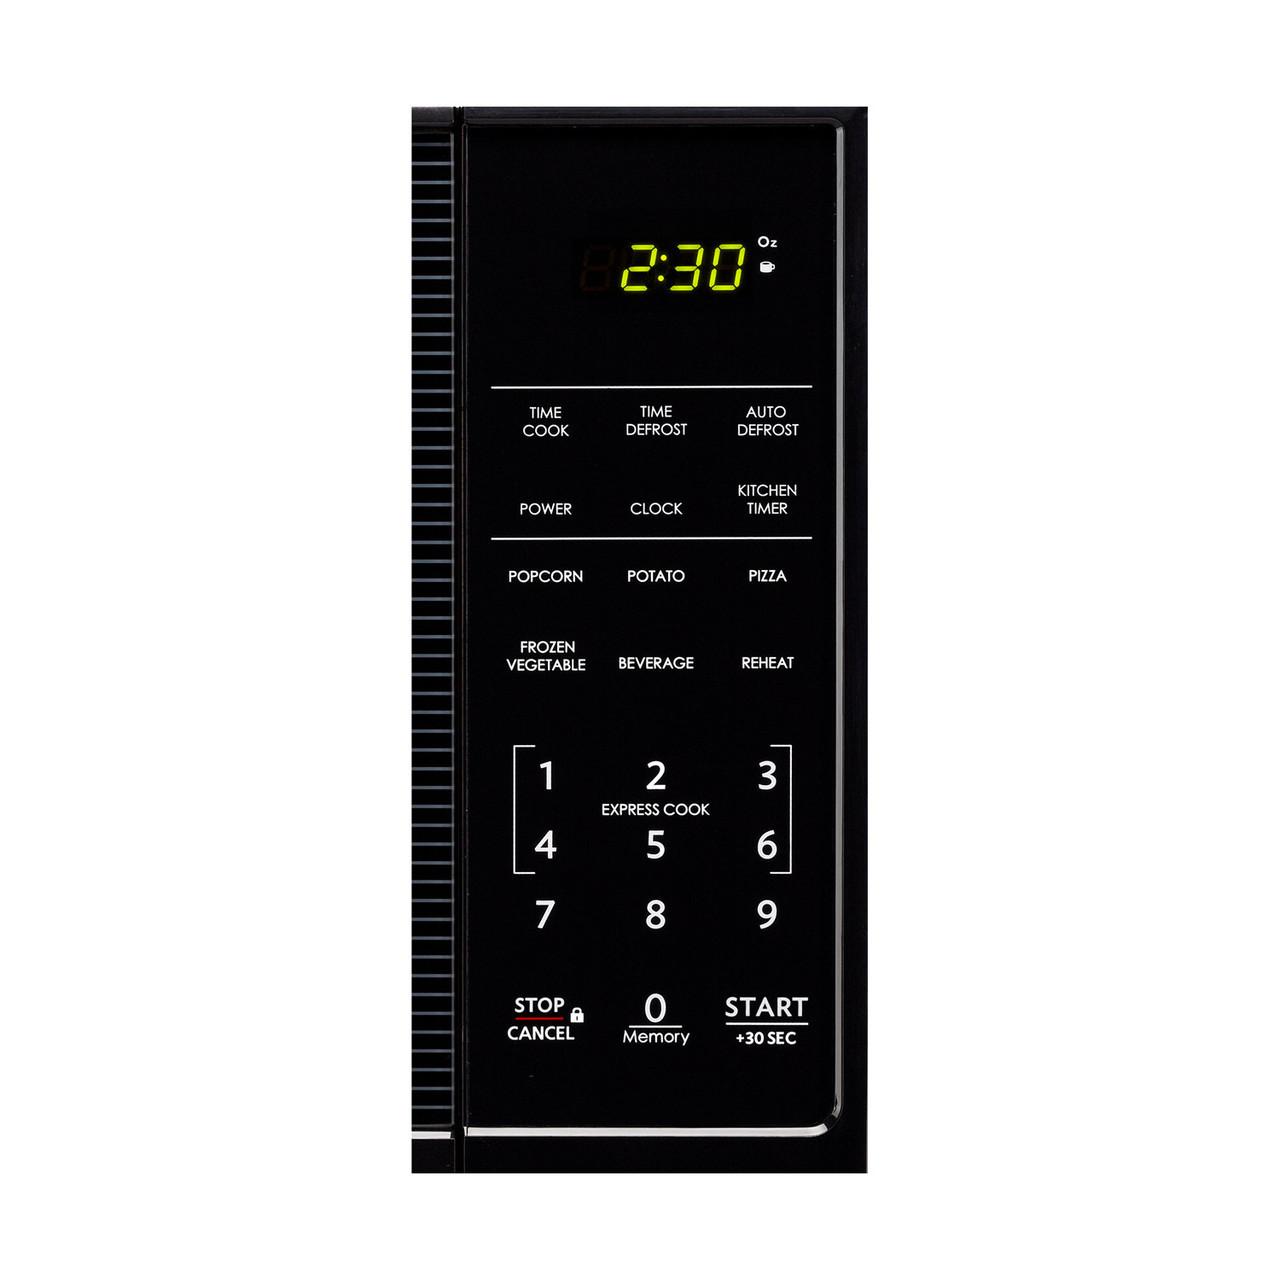 1.1 cu. ft. Sharp Black Carousel Countertop Microwave (SMC1111AB) – control panel